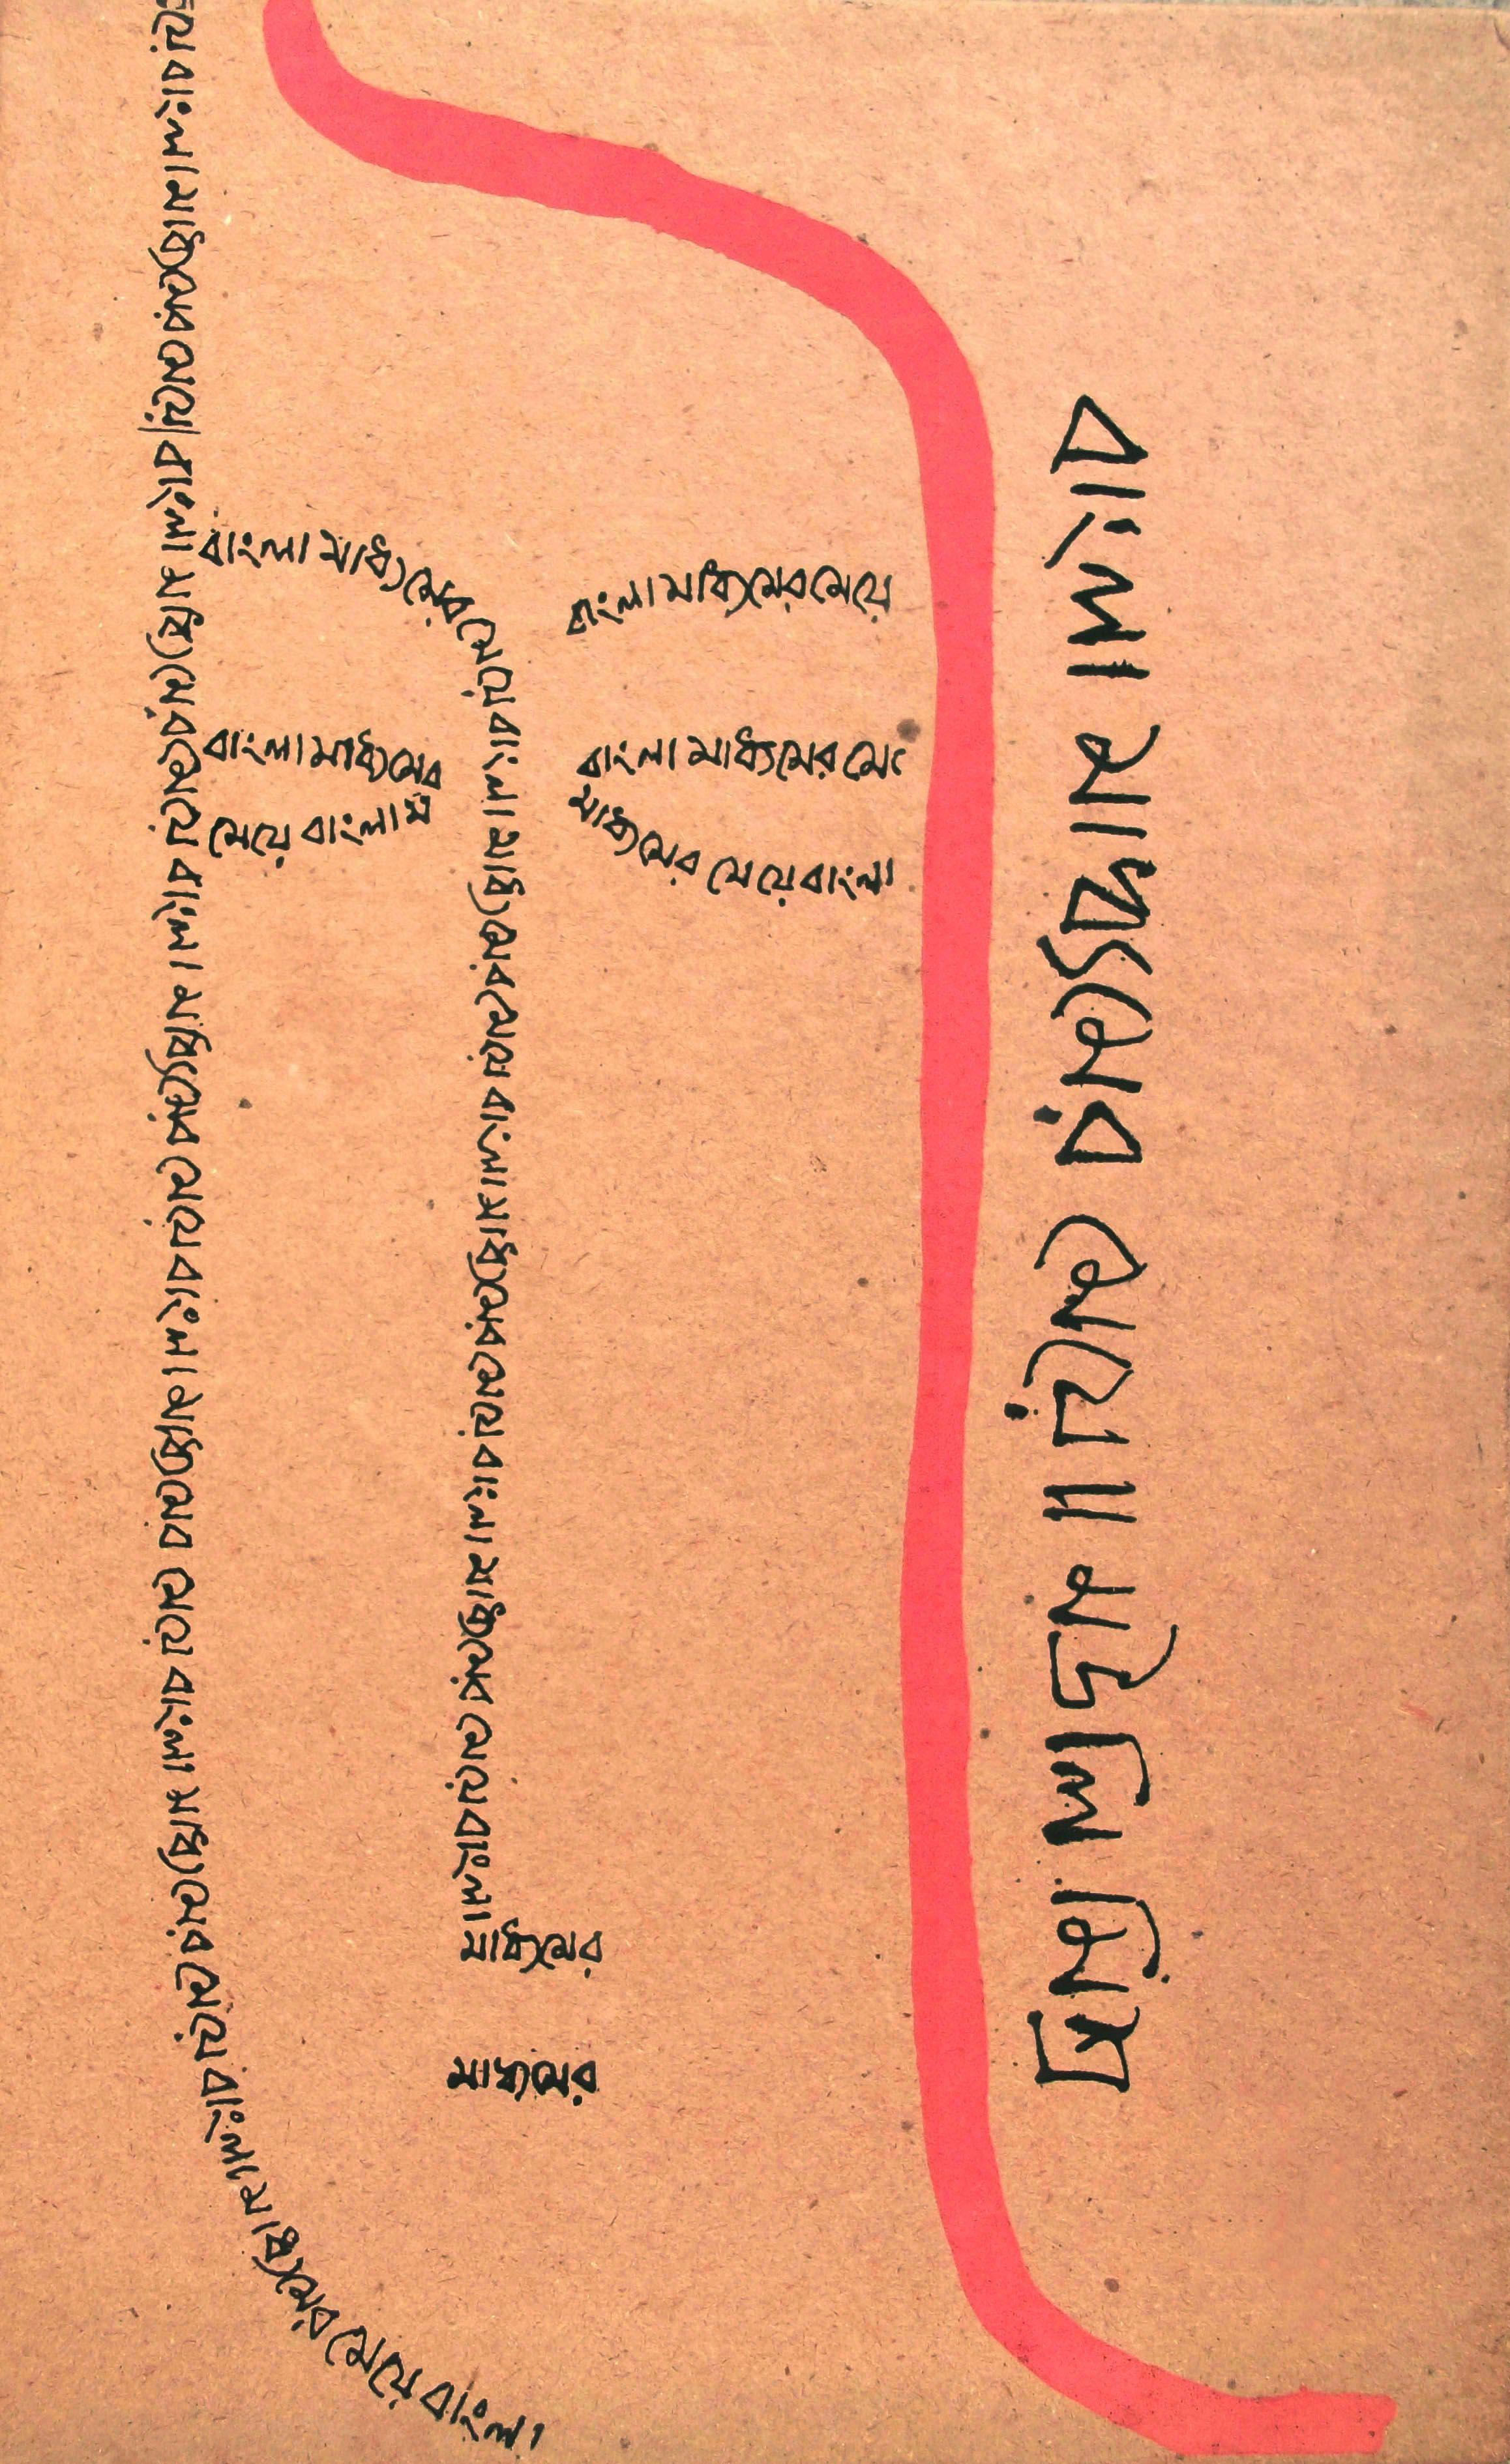 Book Cover Design Reference : Book cover by krishnendu chaki design and